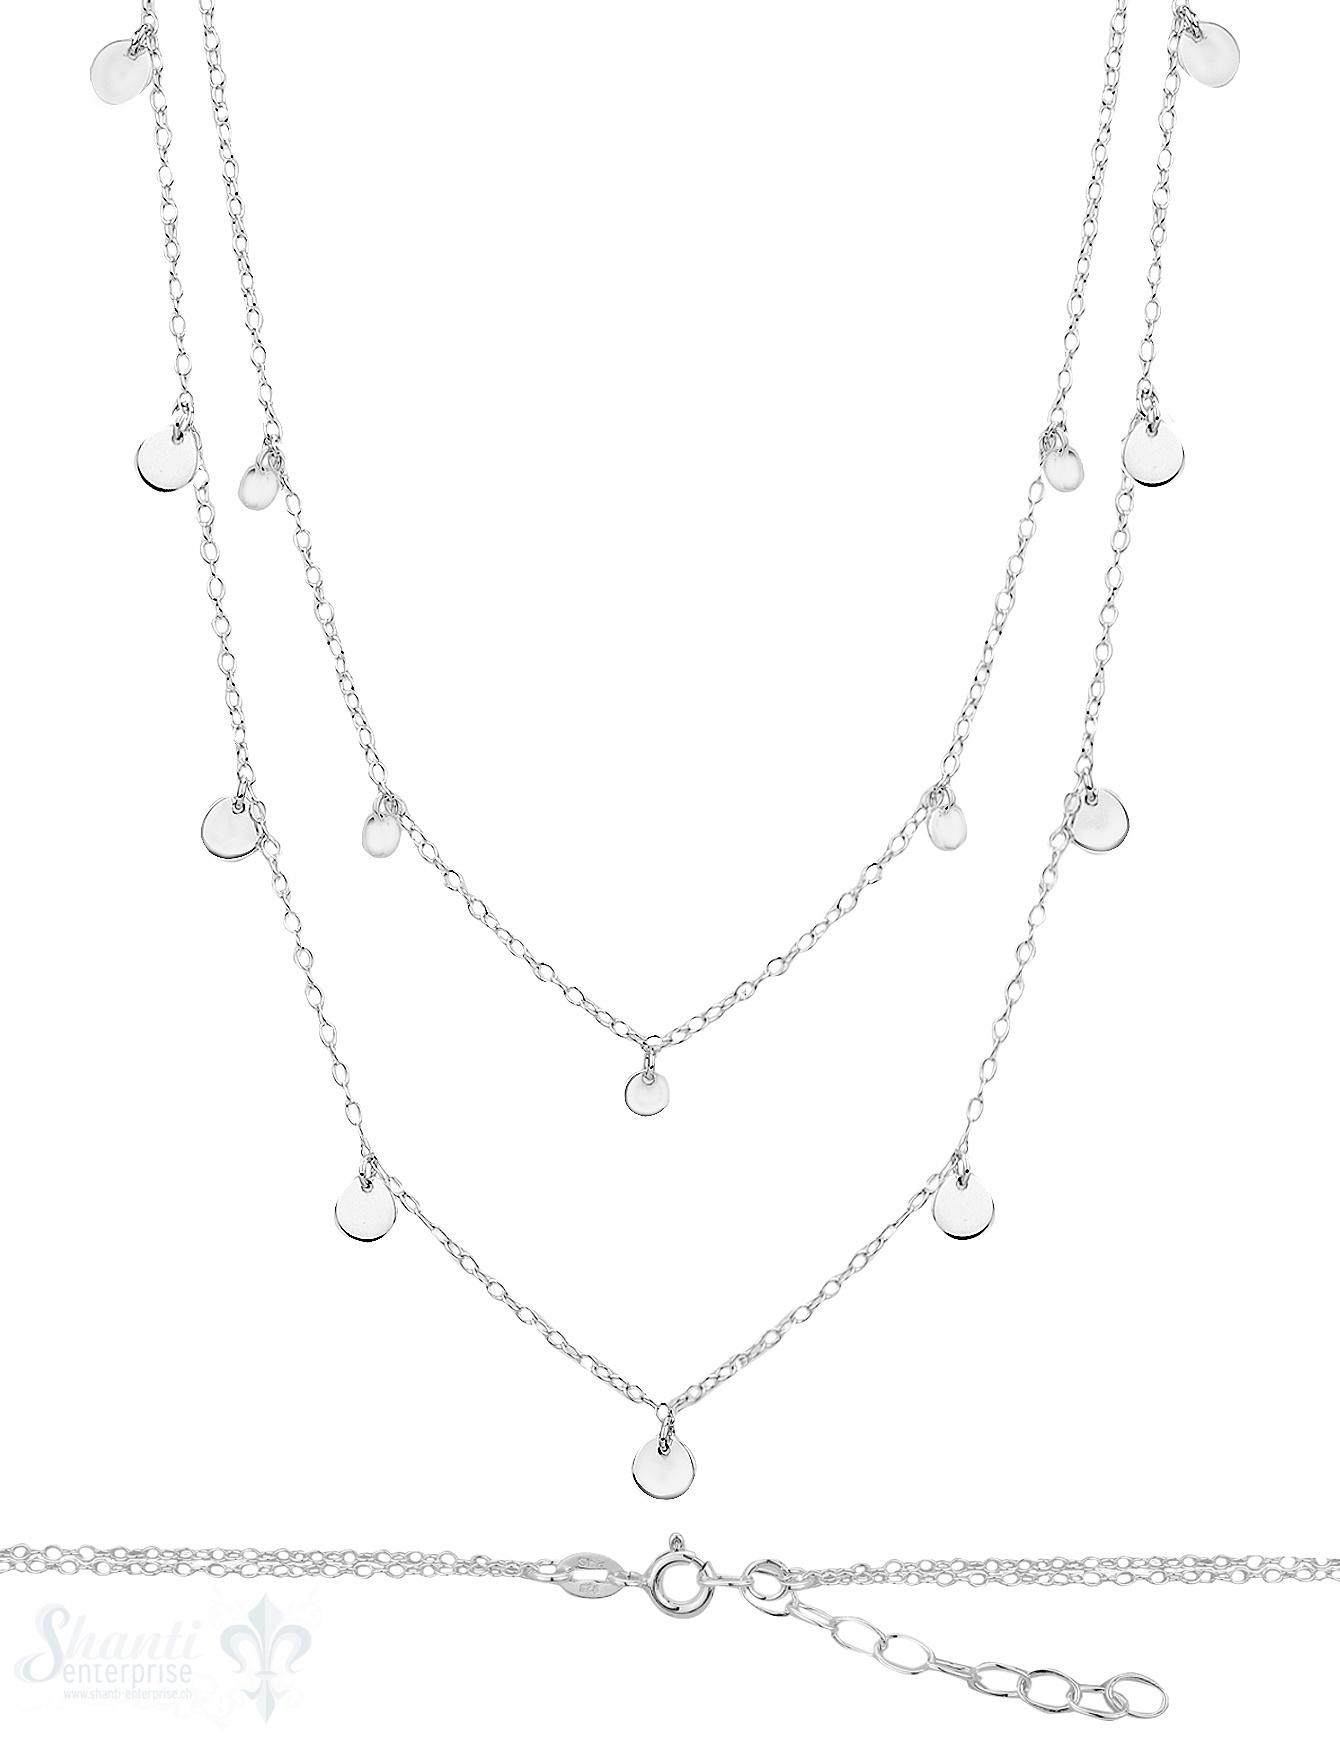 Silberkette Choker doppelreihig 34+42cm Plaquetten